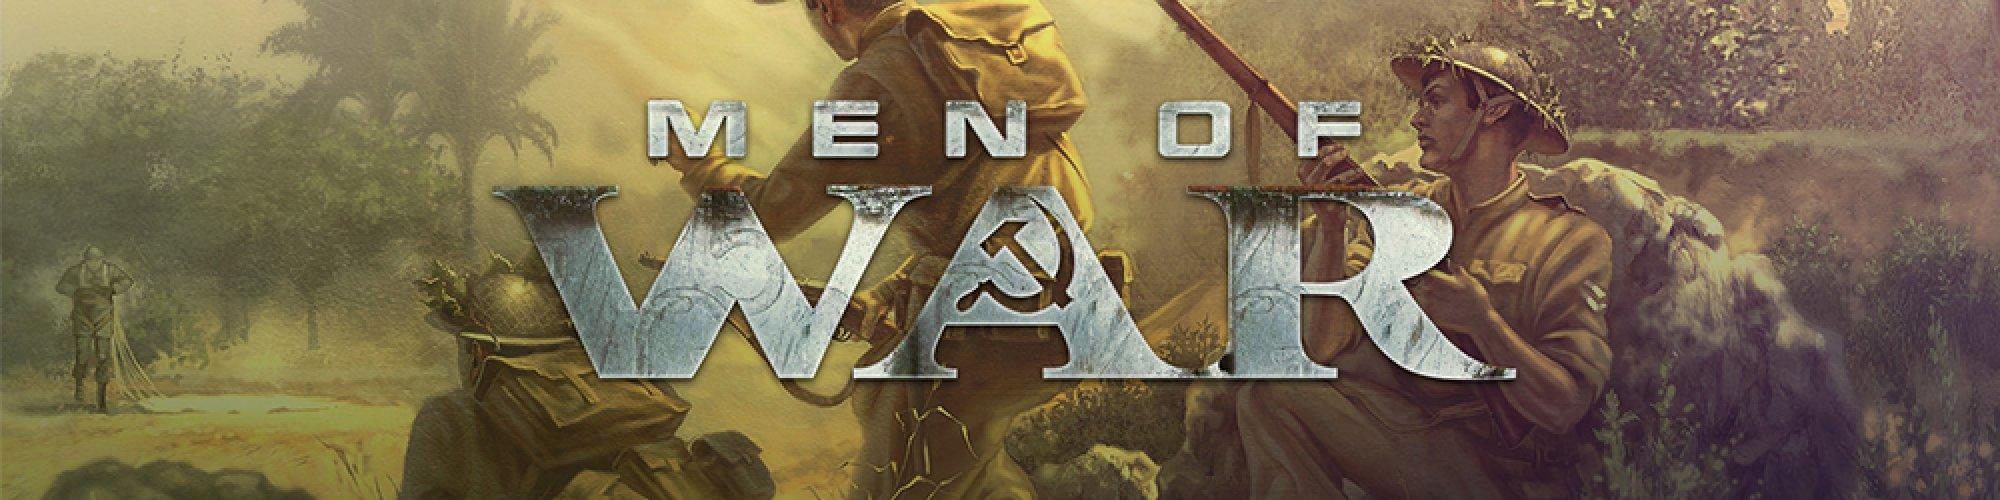 Men of War banner